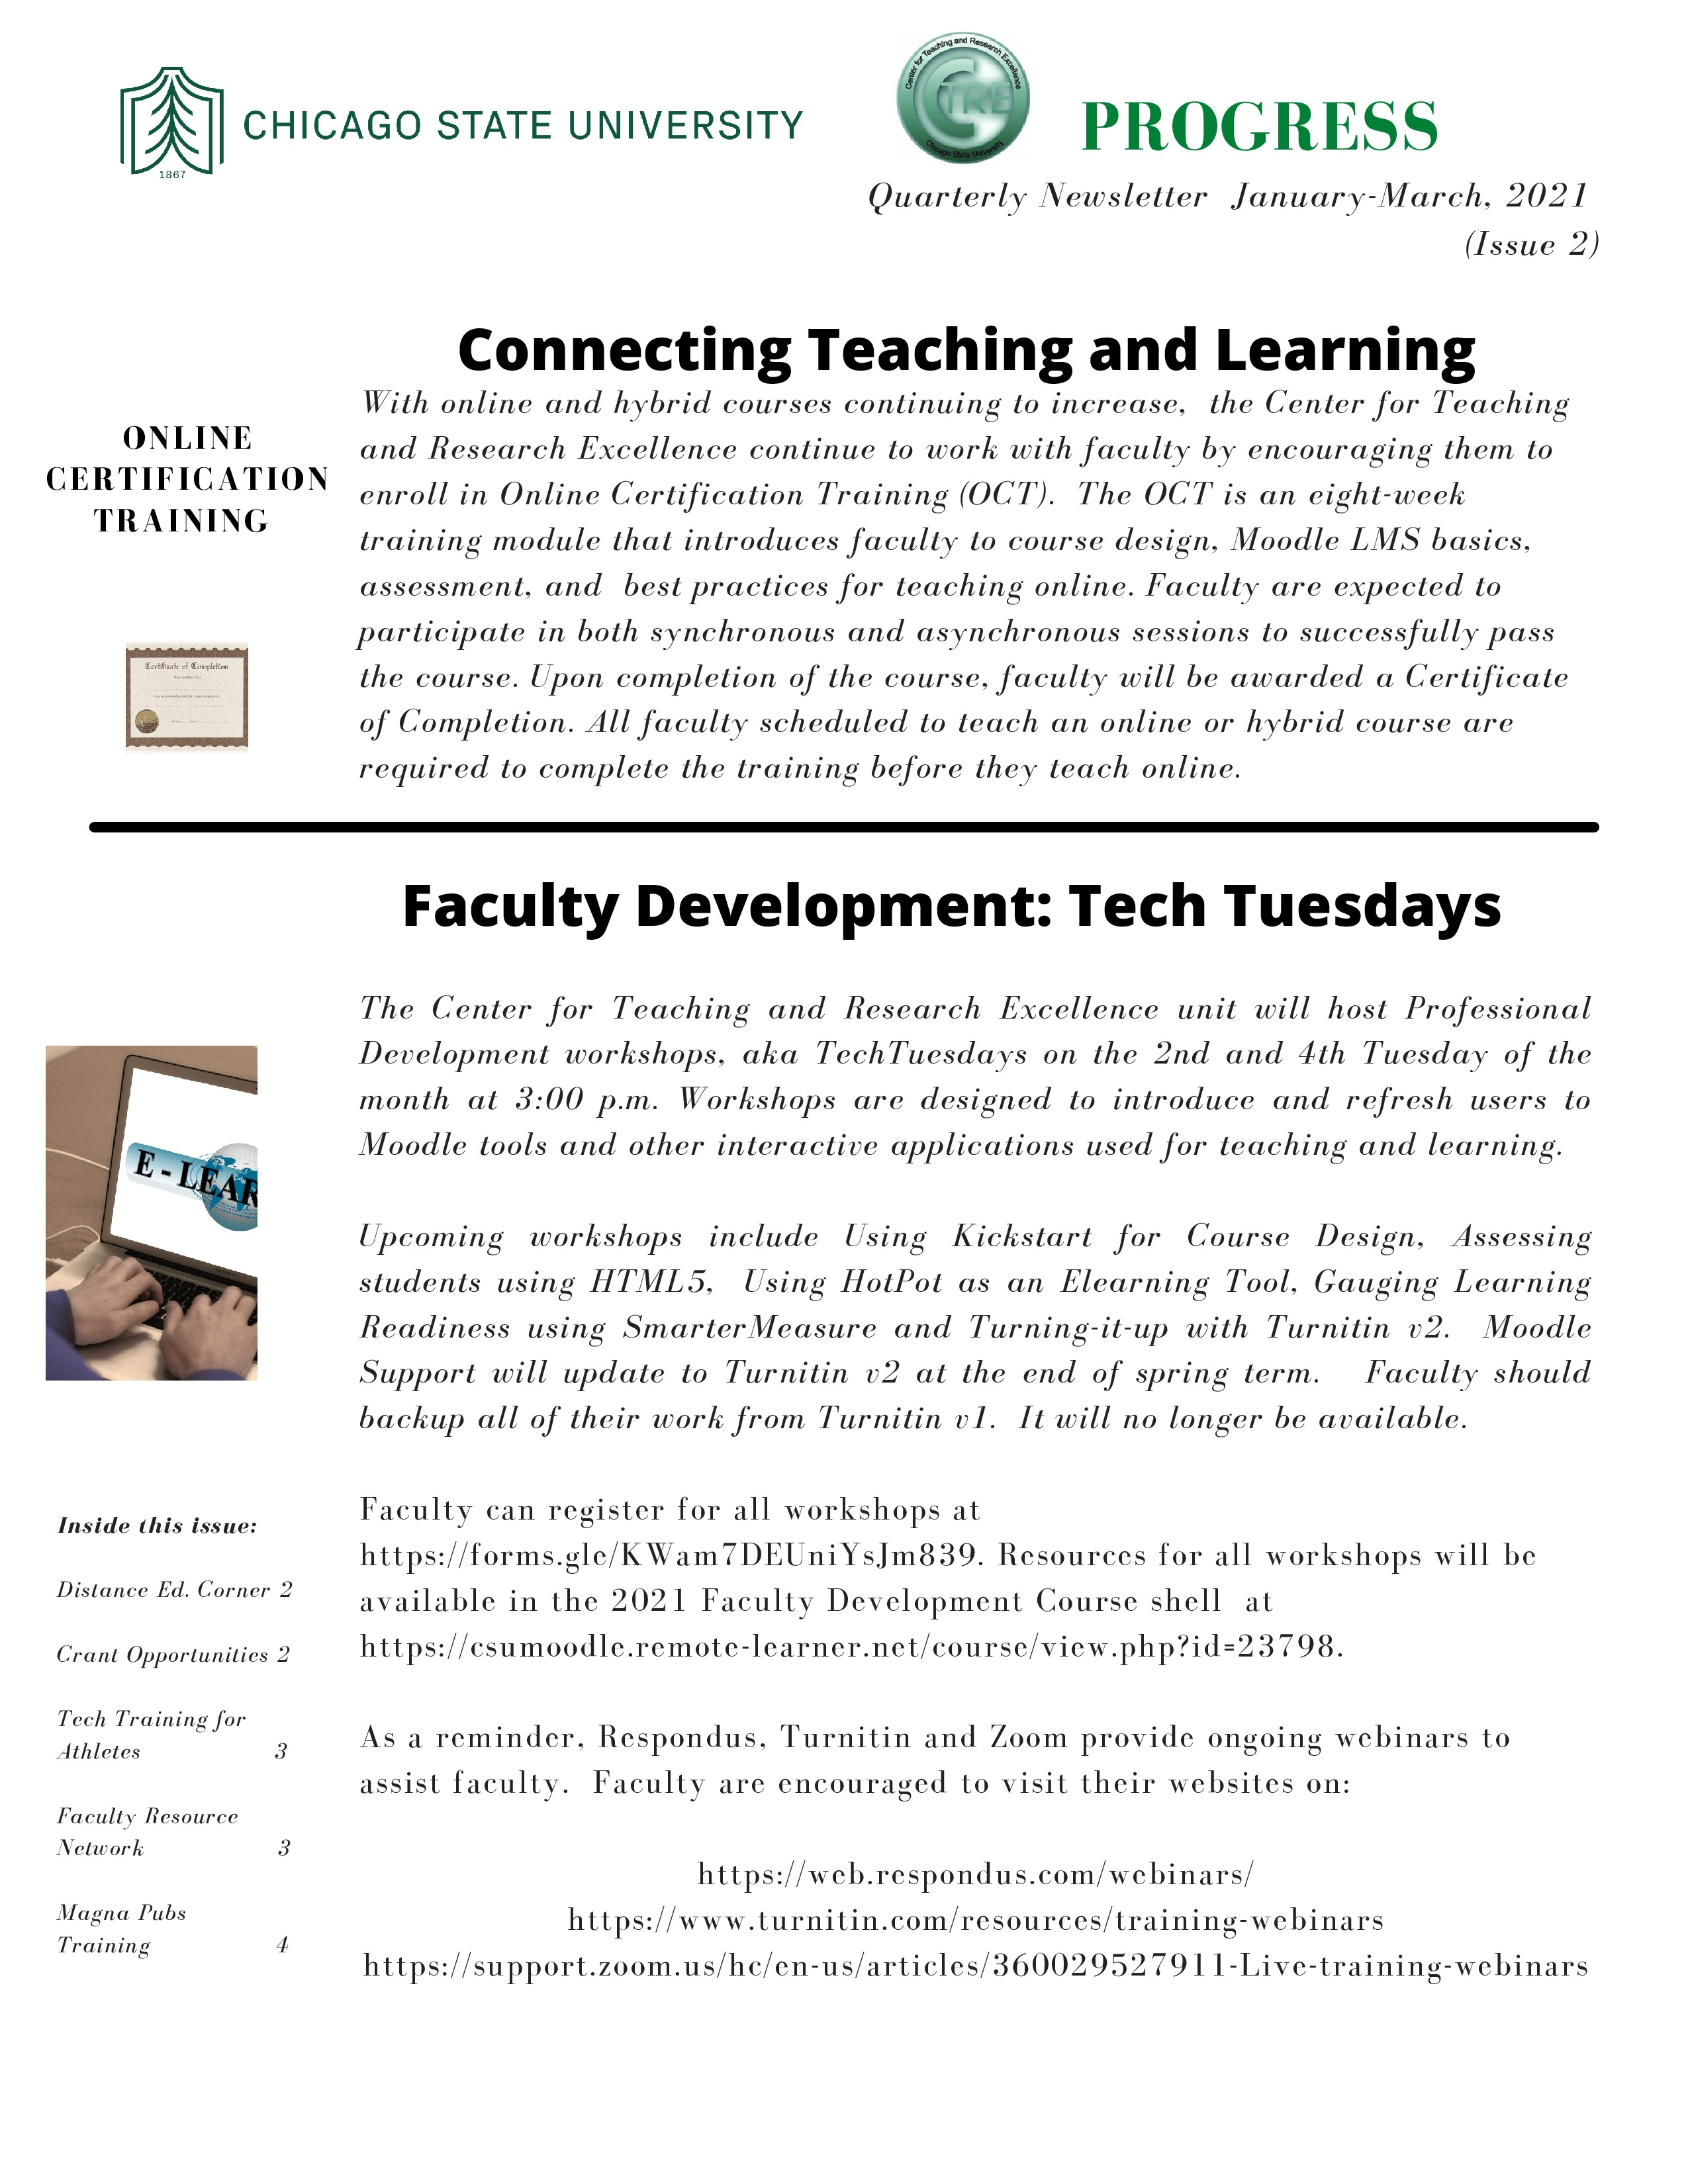 CTRE Newsletter Jan.-Mar. 2021